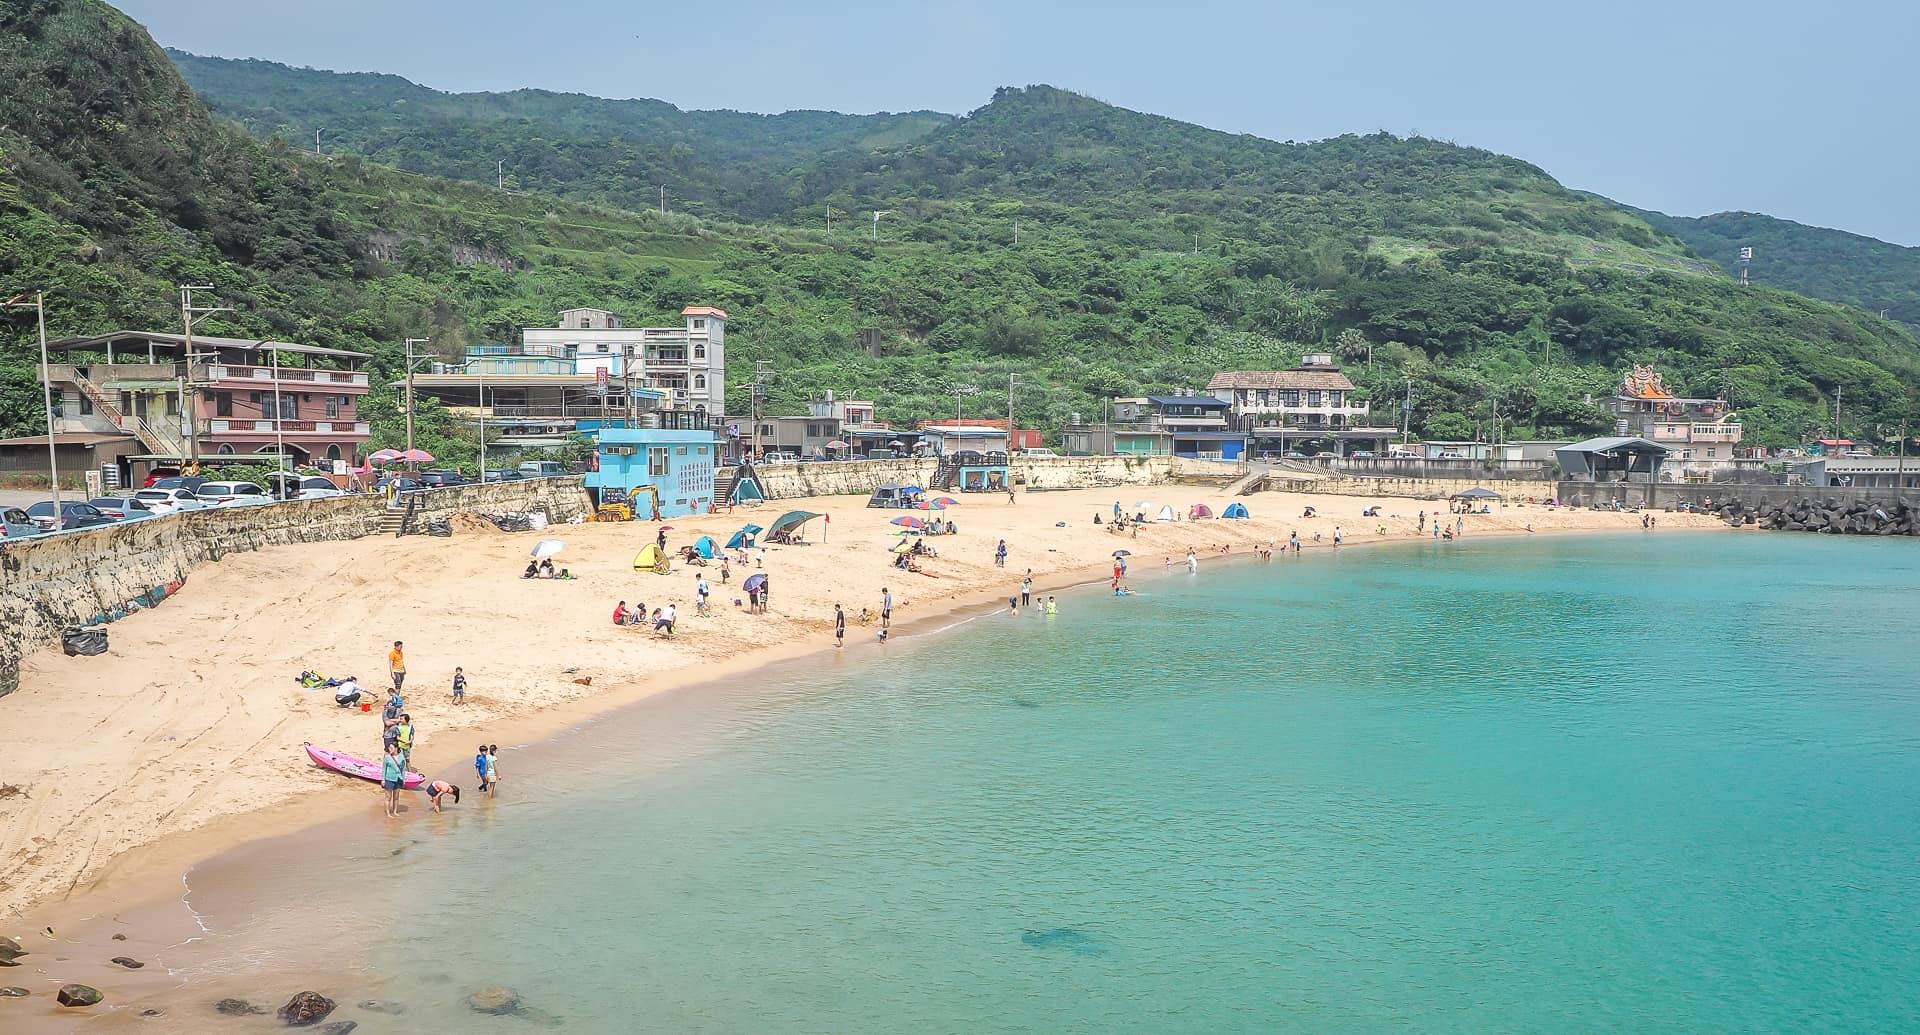 The best Taipei beaches and Taiwan beaches